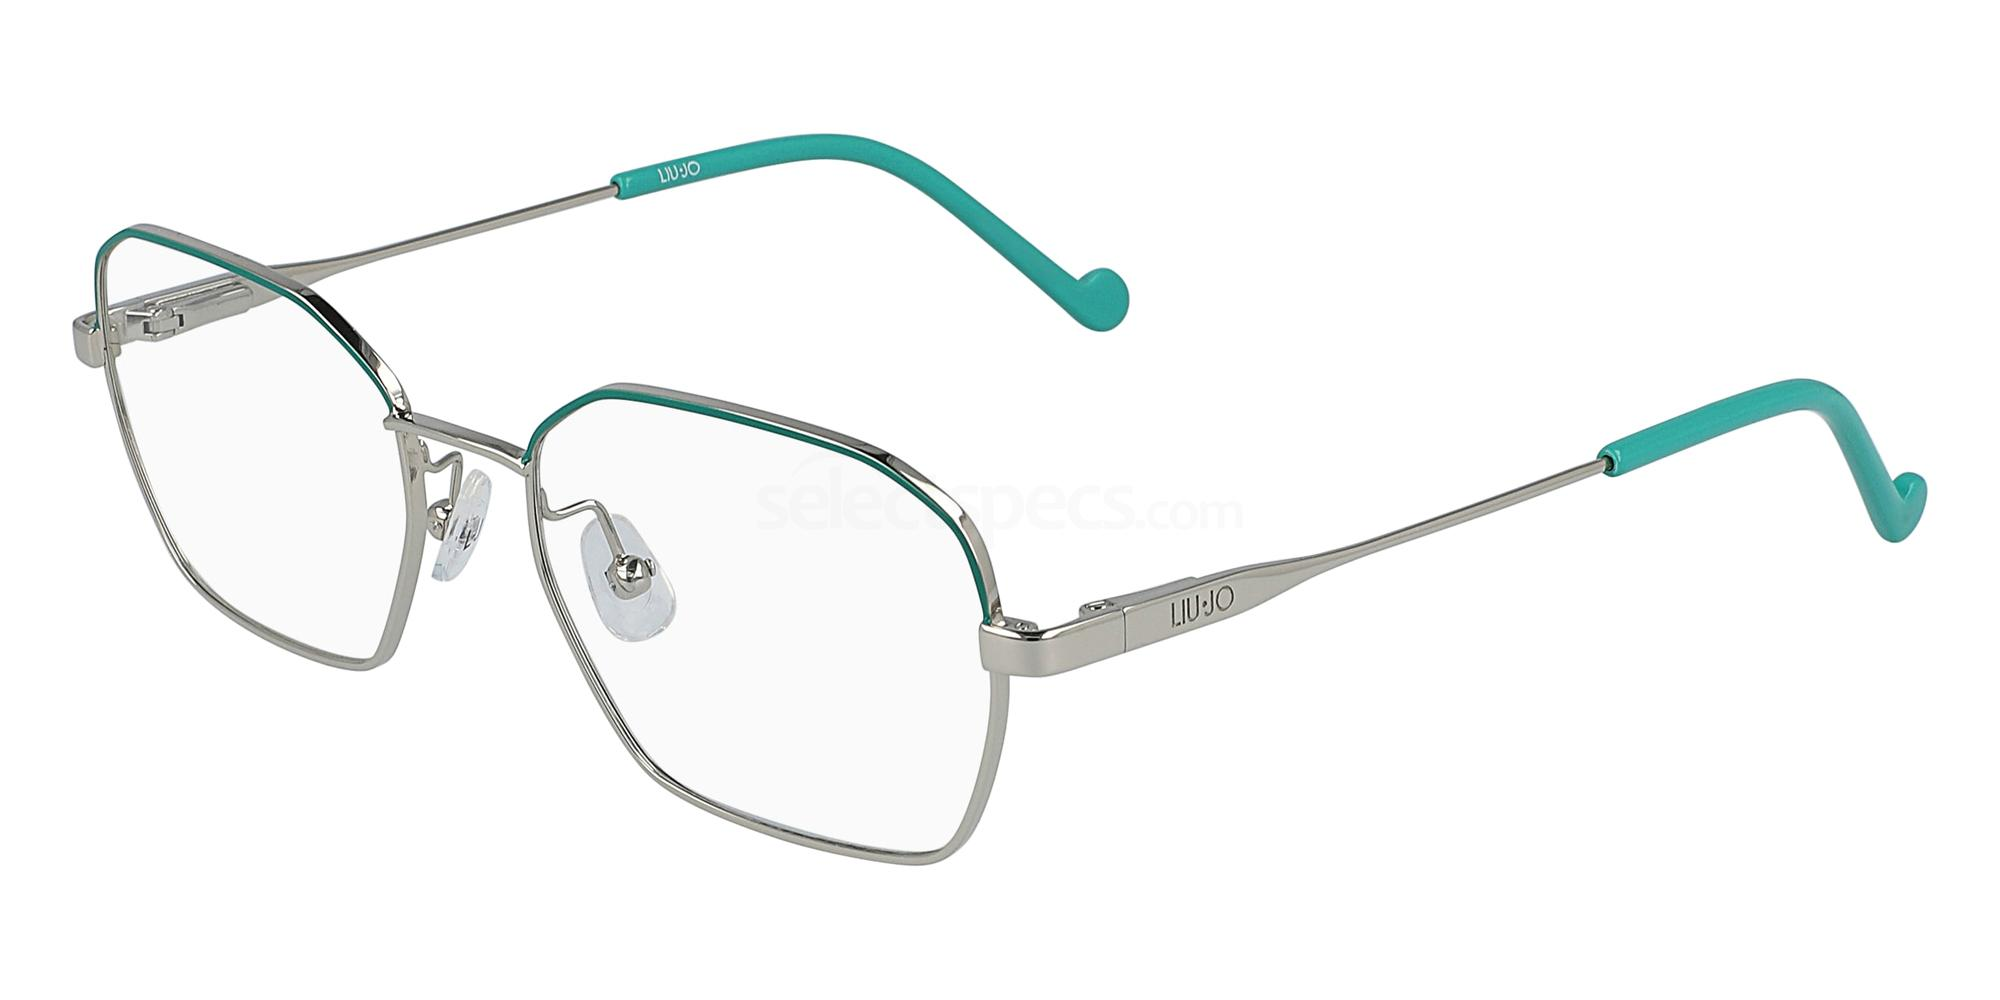 045 LJ2134 Glasses, Liu Jo